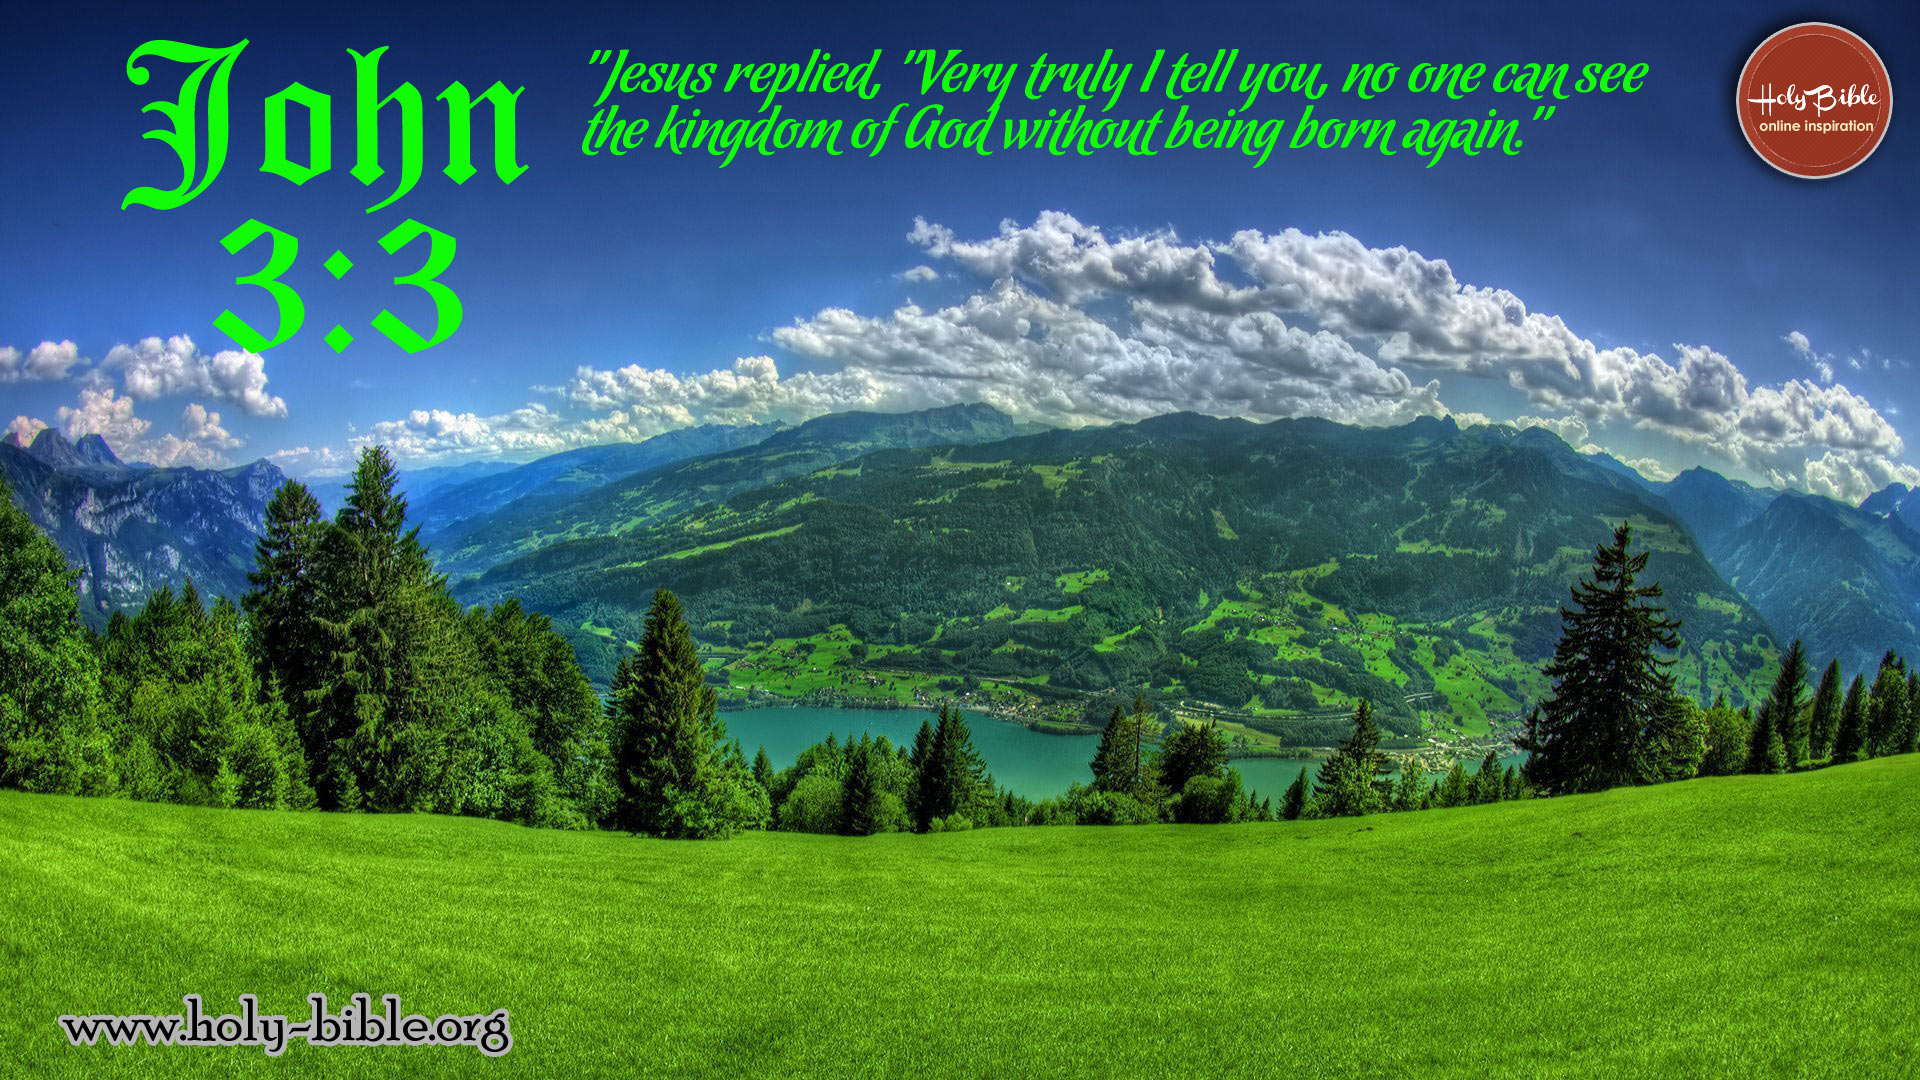 Bible Verse of the day - John 3:3